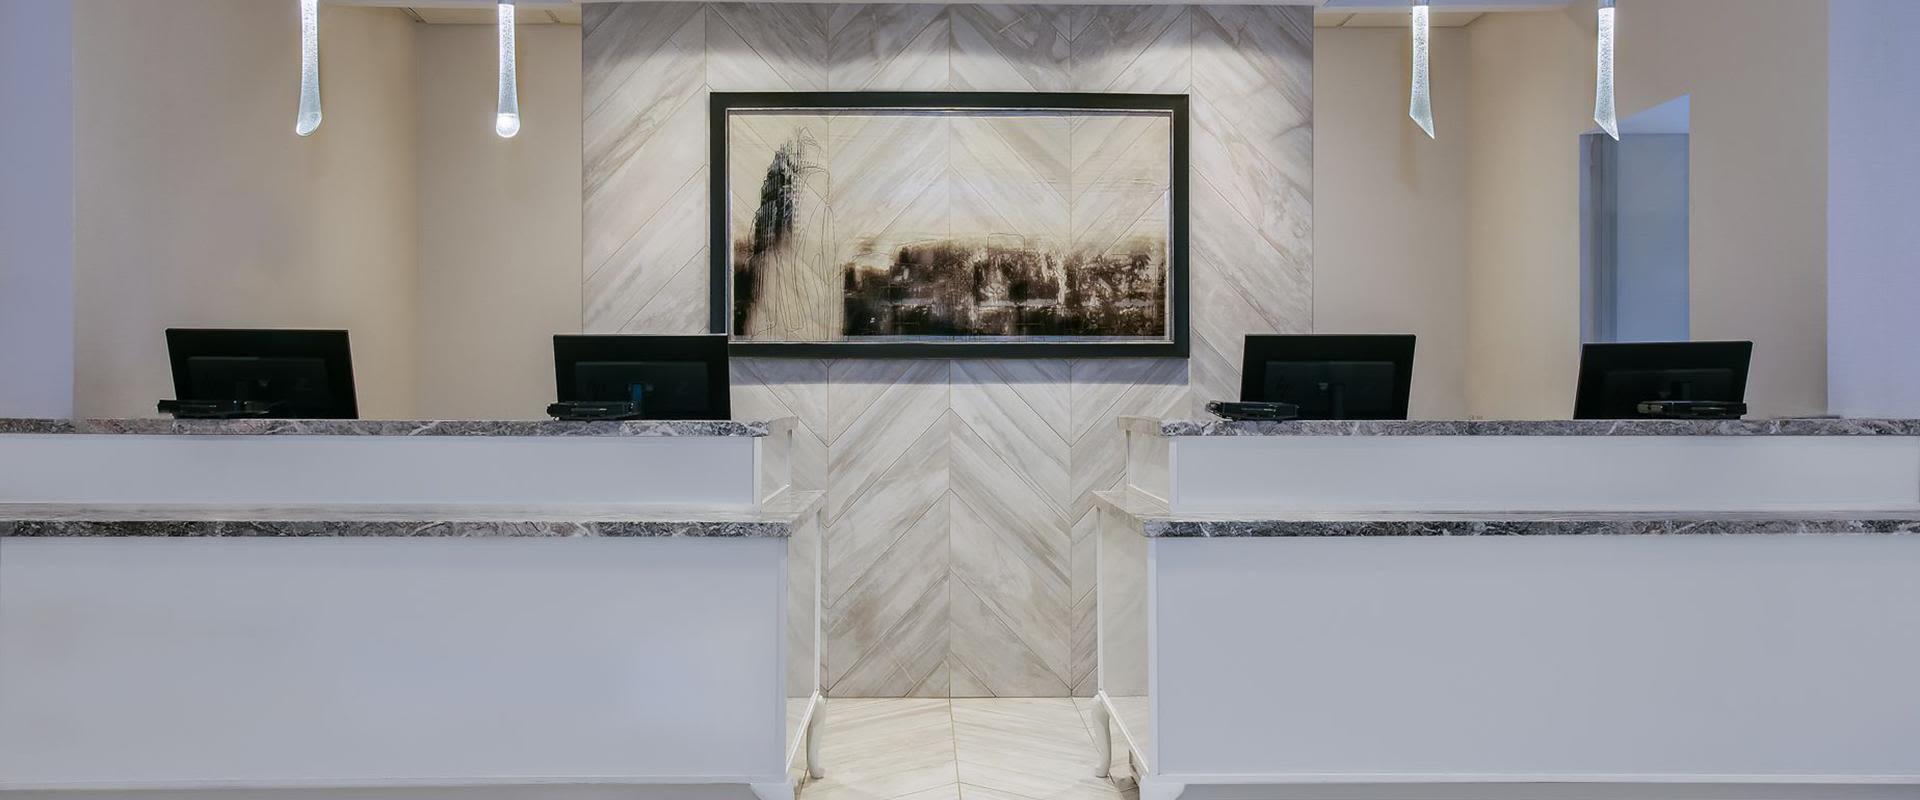 Charlotte NC Hotel Front Desk Reception